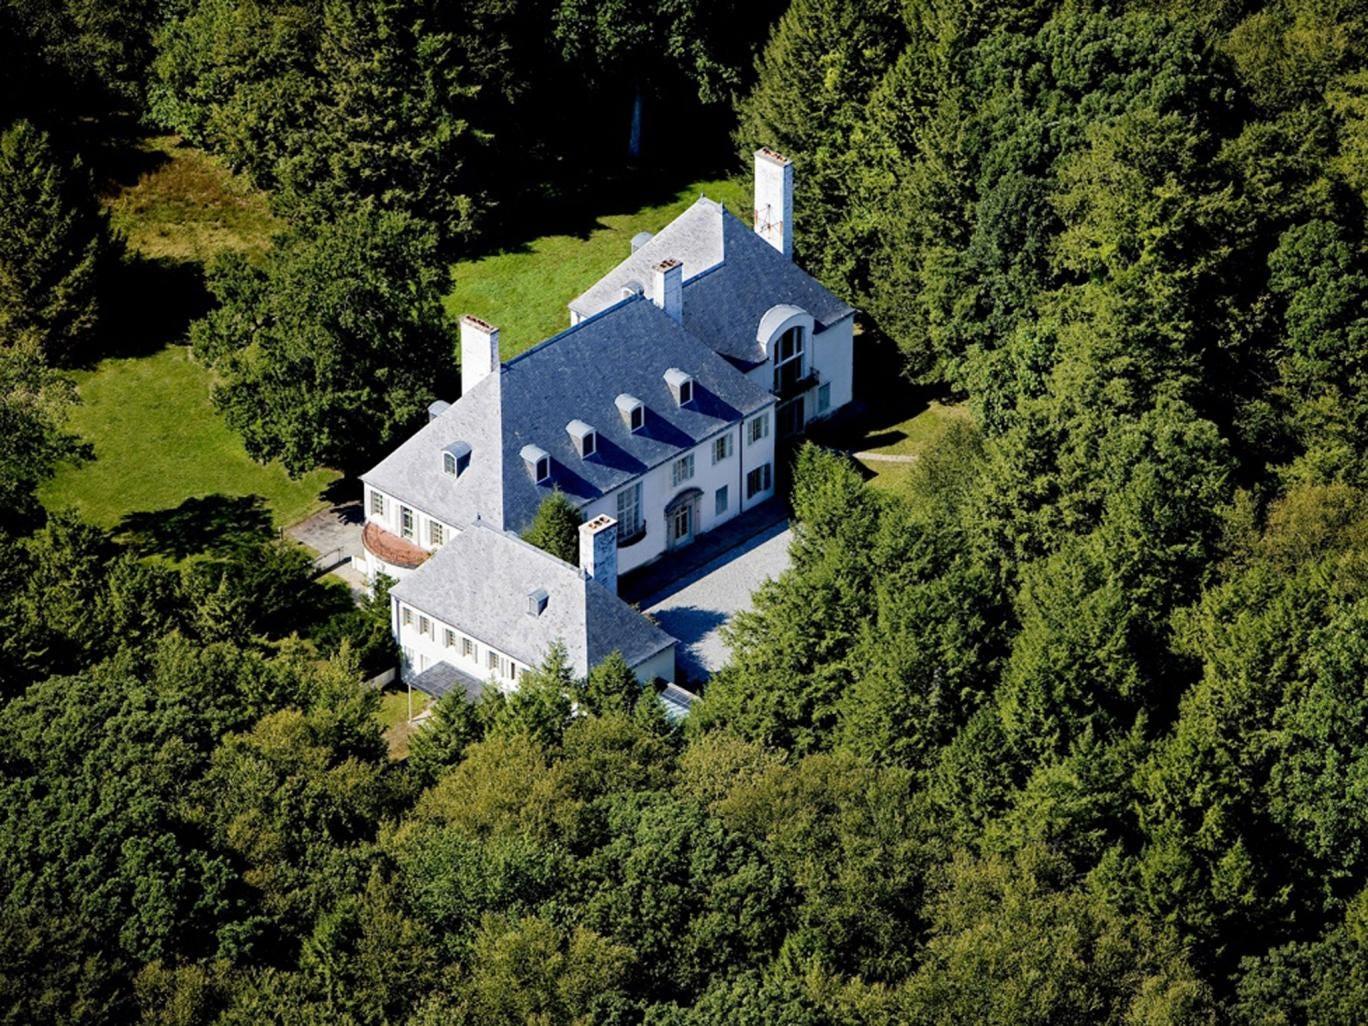 Clark bought this $24m Connecticut estate but left it empty for decades